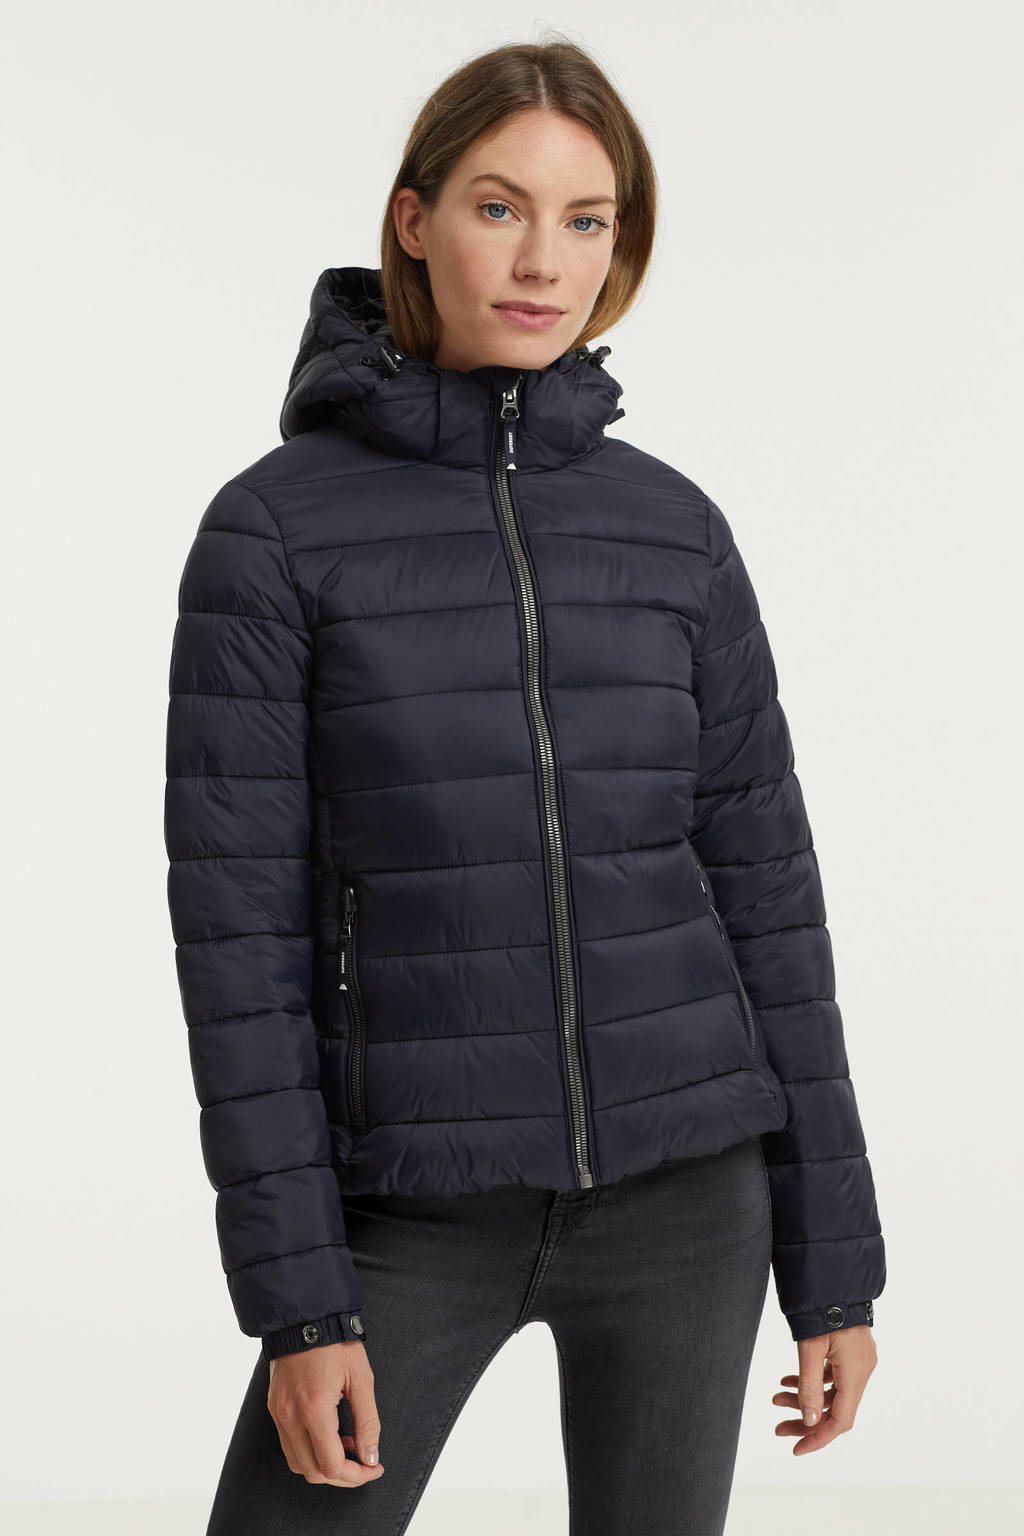 Superdry gewatteerde jas Classic Fuji donkerblauw, Donkerblauw